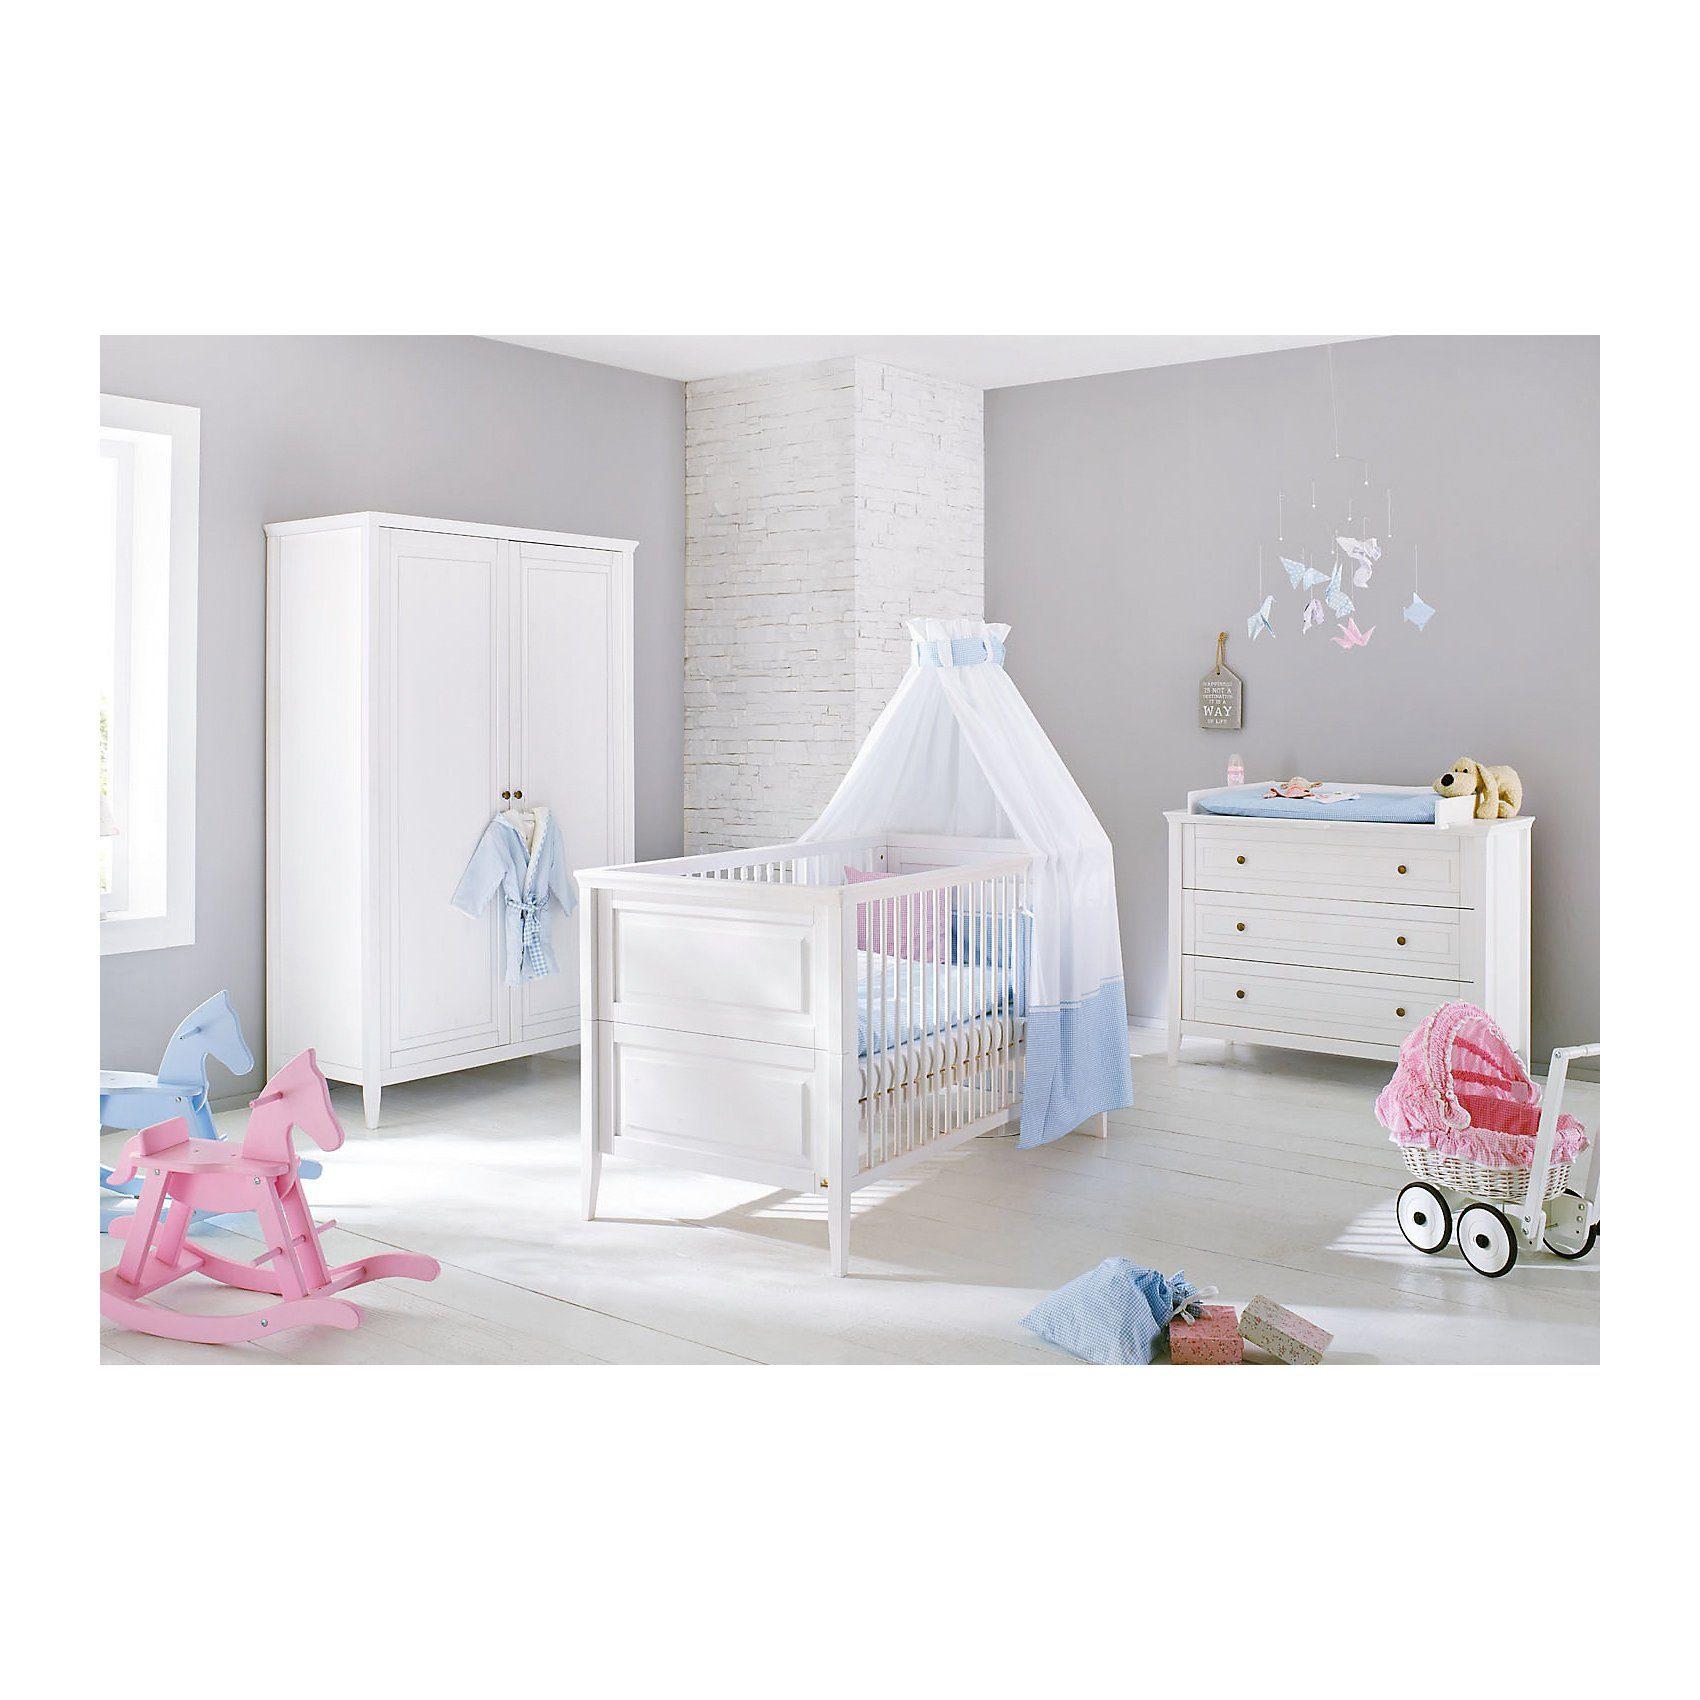 Pinolino Komplett Kinderzimmer SMILLA, (Kinderbett, Wickelkommode und